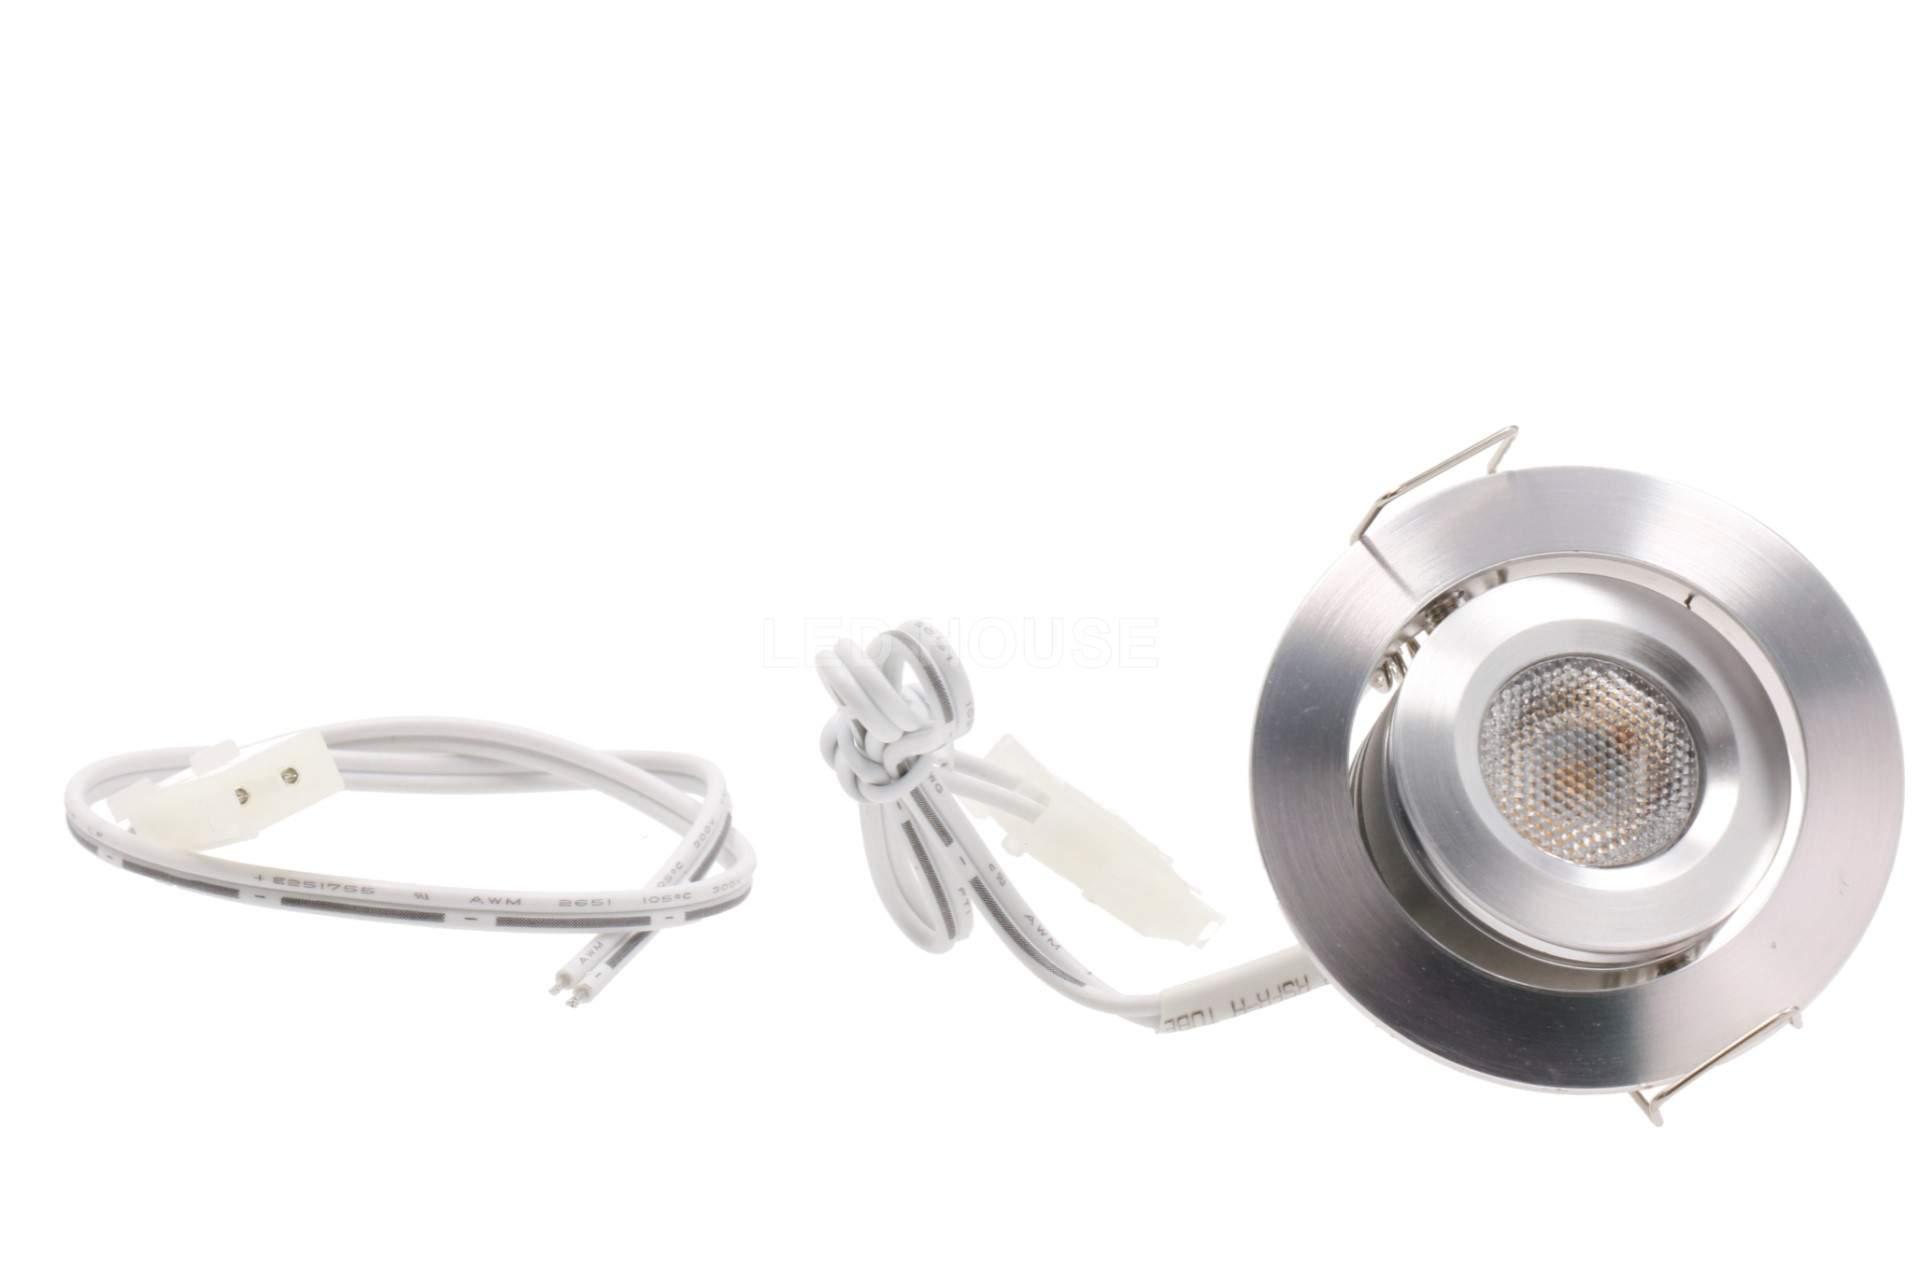 LED светильник для мебели LED светильник для мебели REVAL BULB MV-H серебряный круглый 12V 3W 115lm CRI80  45° IP20 3000K теплый белый